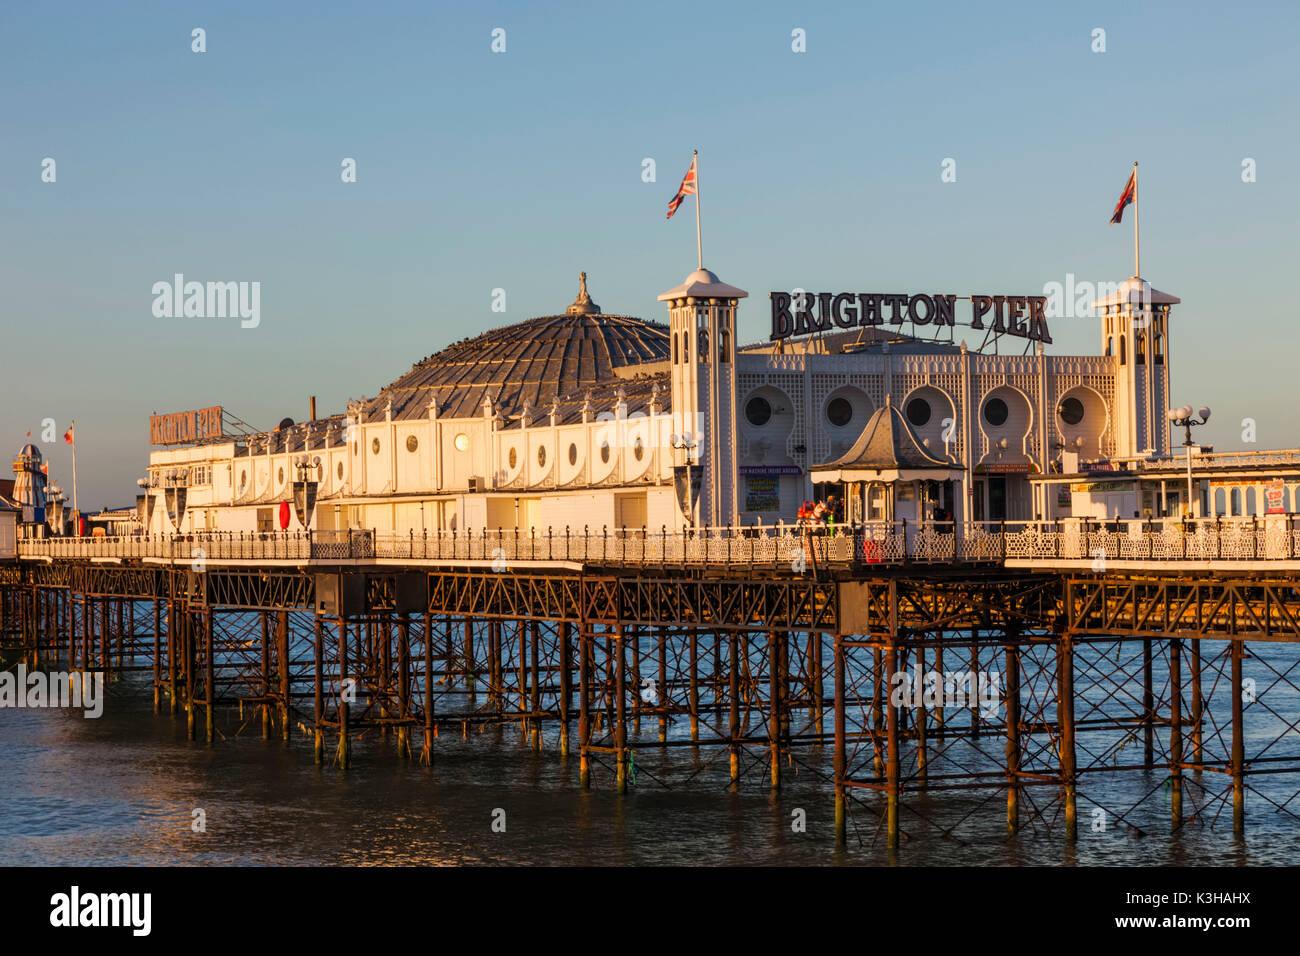 England, East Sussex, Brighton, Brighton Pier - Stock Image